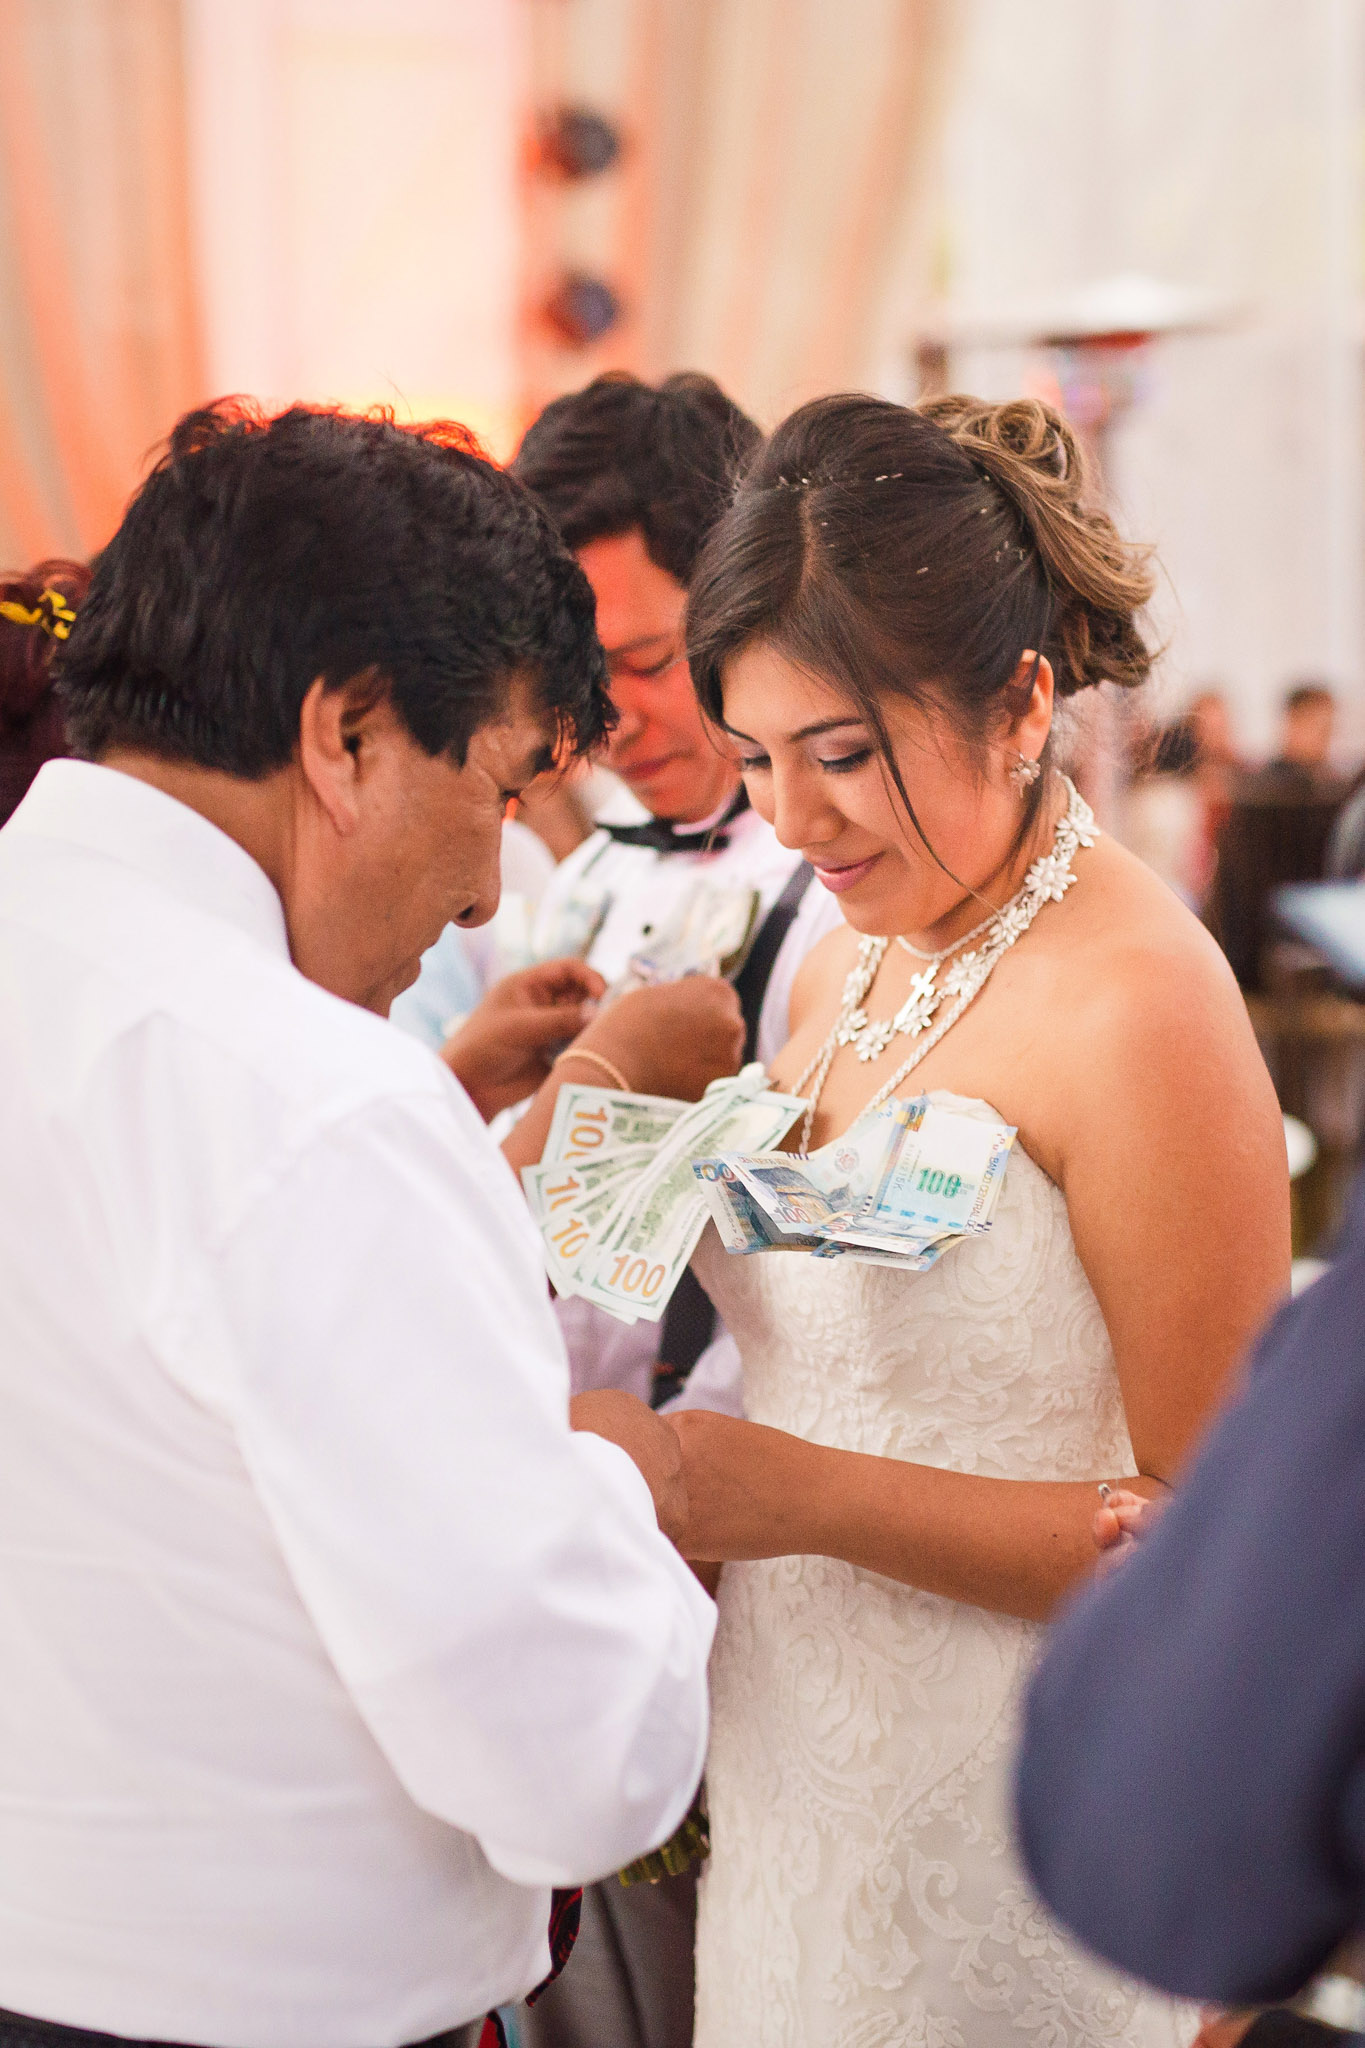 Wedding-Travellers-Destination-Wedding-Peru-Cusco-Hacienda-Sarapampa-Sacred-Valley-tradition-money